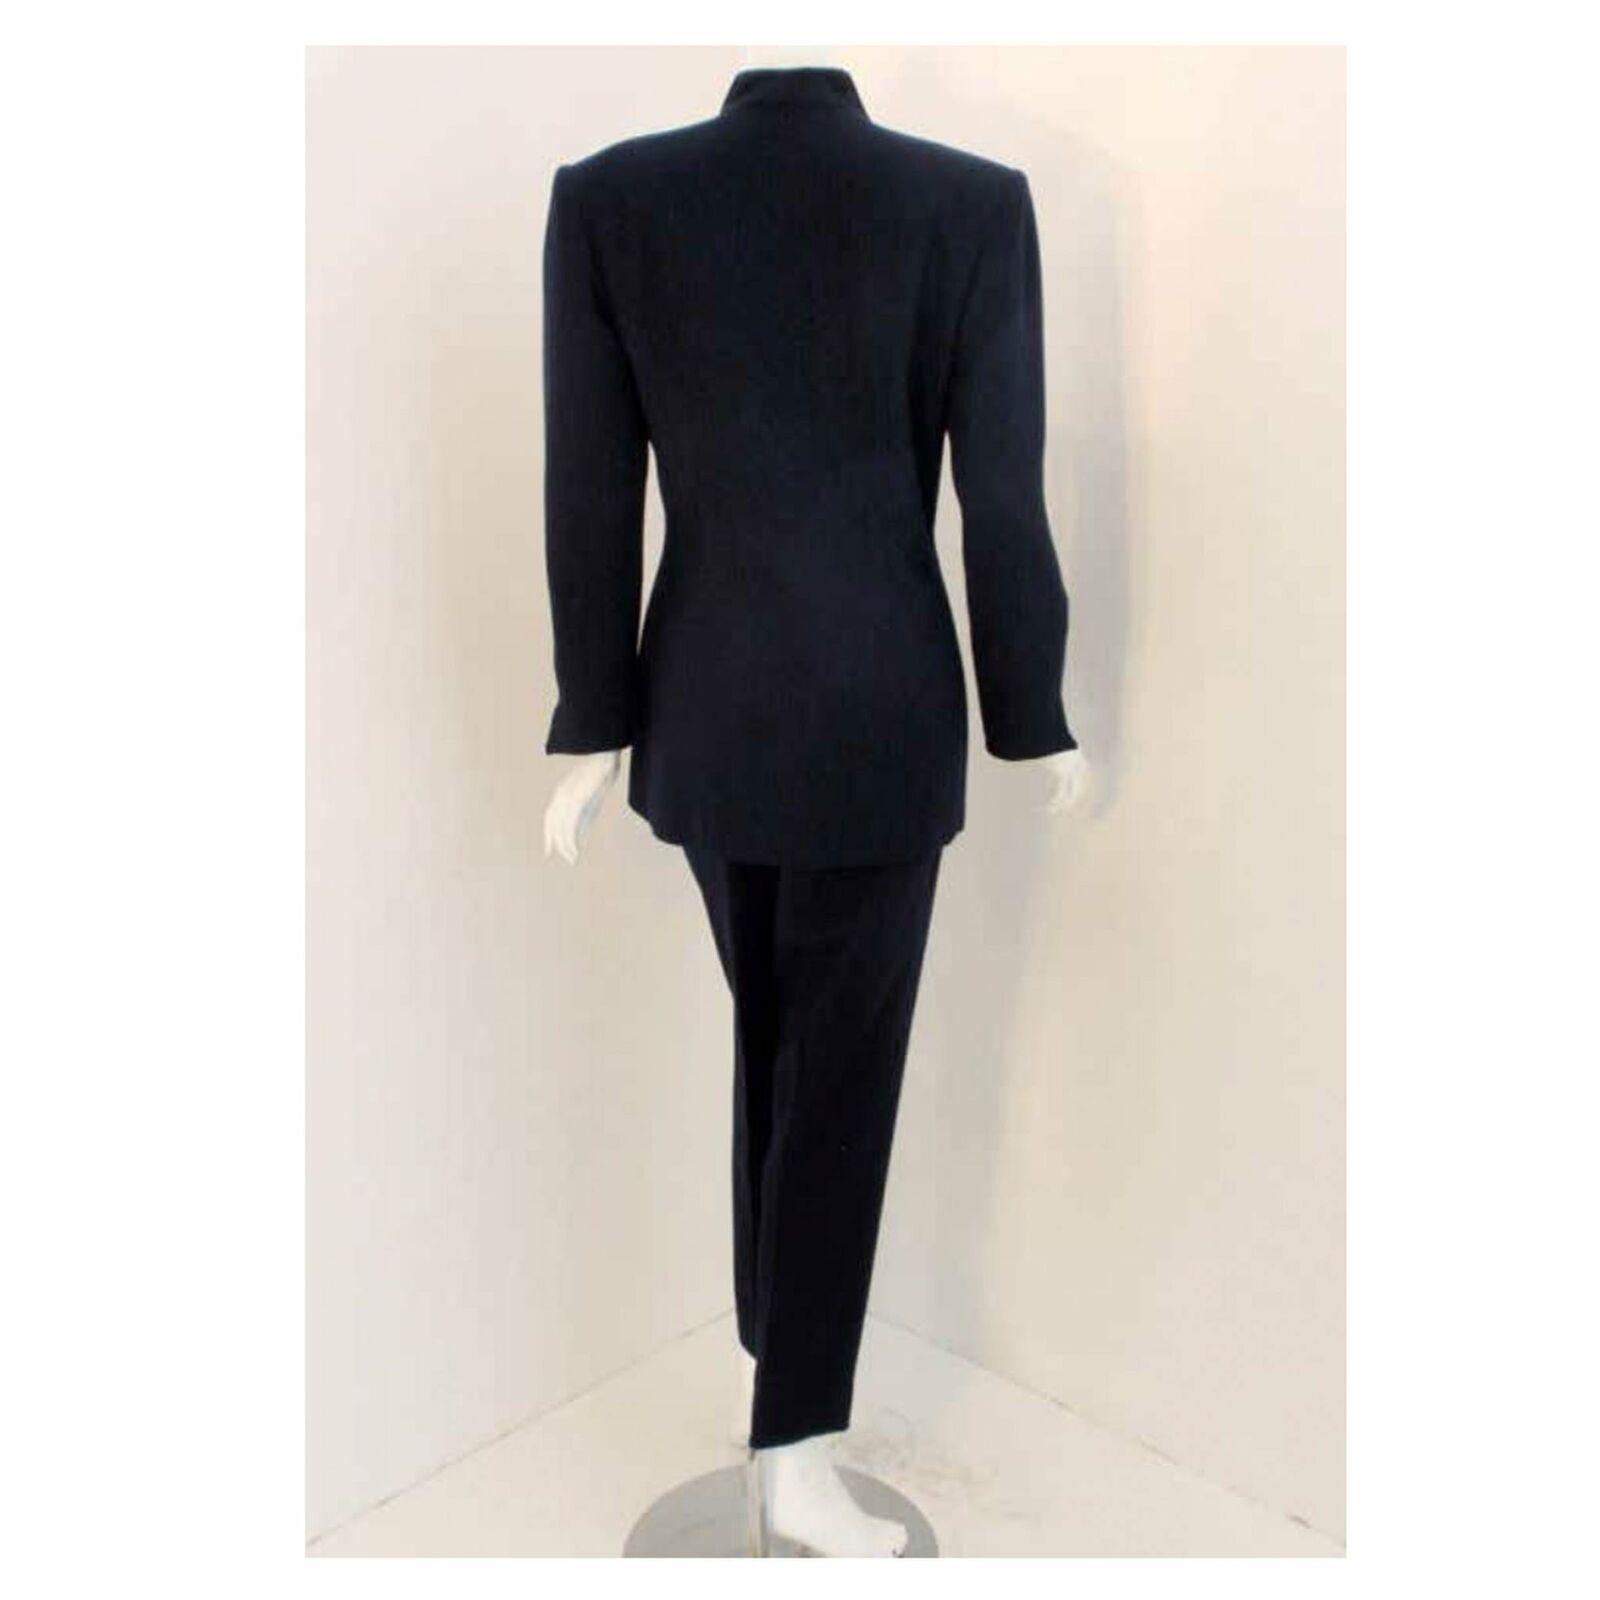 CHRISTIAN DIOR 1980s 2 pc Dark Blue Pant Suit - image 2